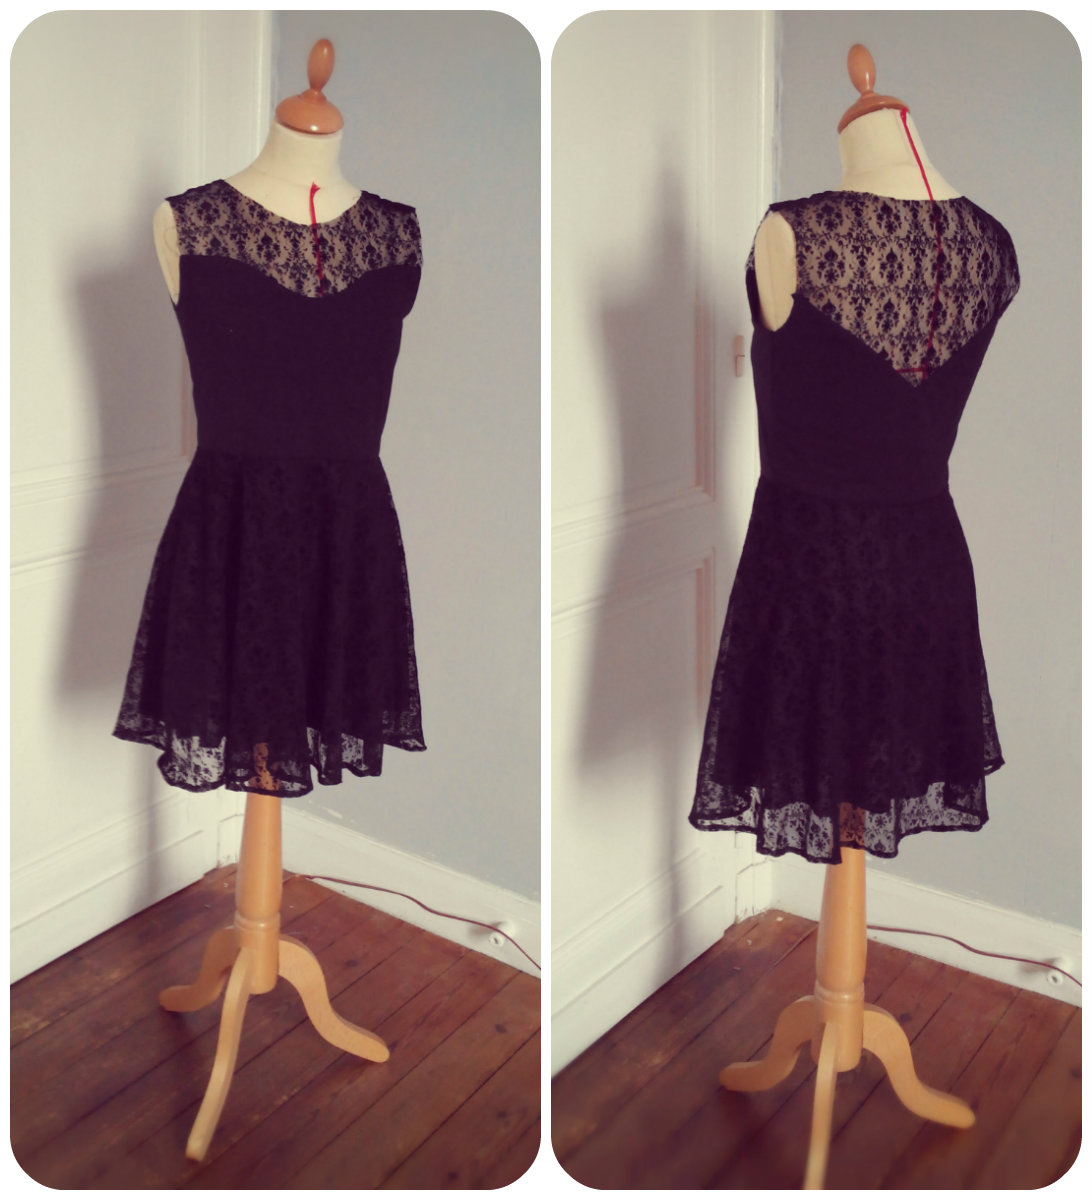 diy fabriquer une robe en dentelle. Black Bedroom Furniture Sets. Home Design Ideas